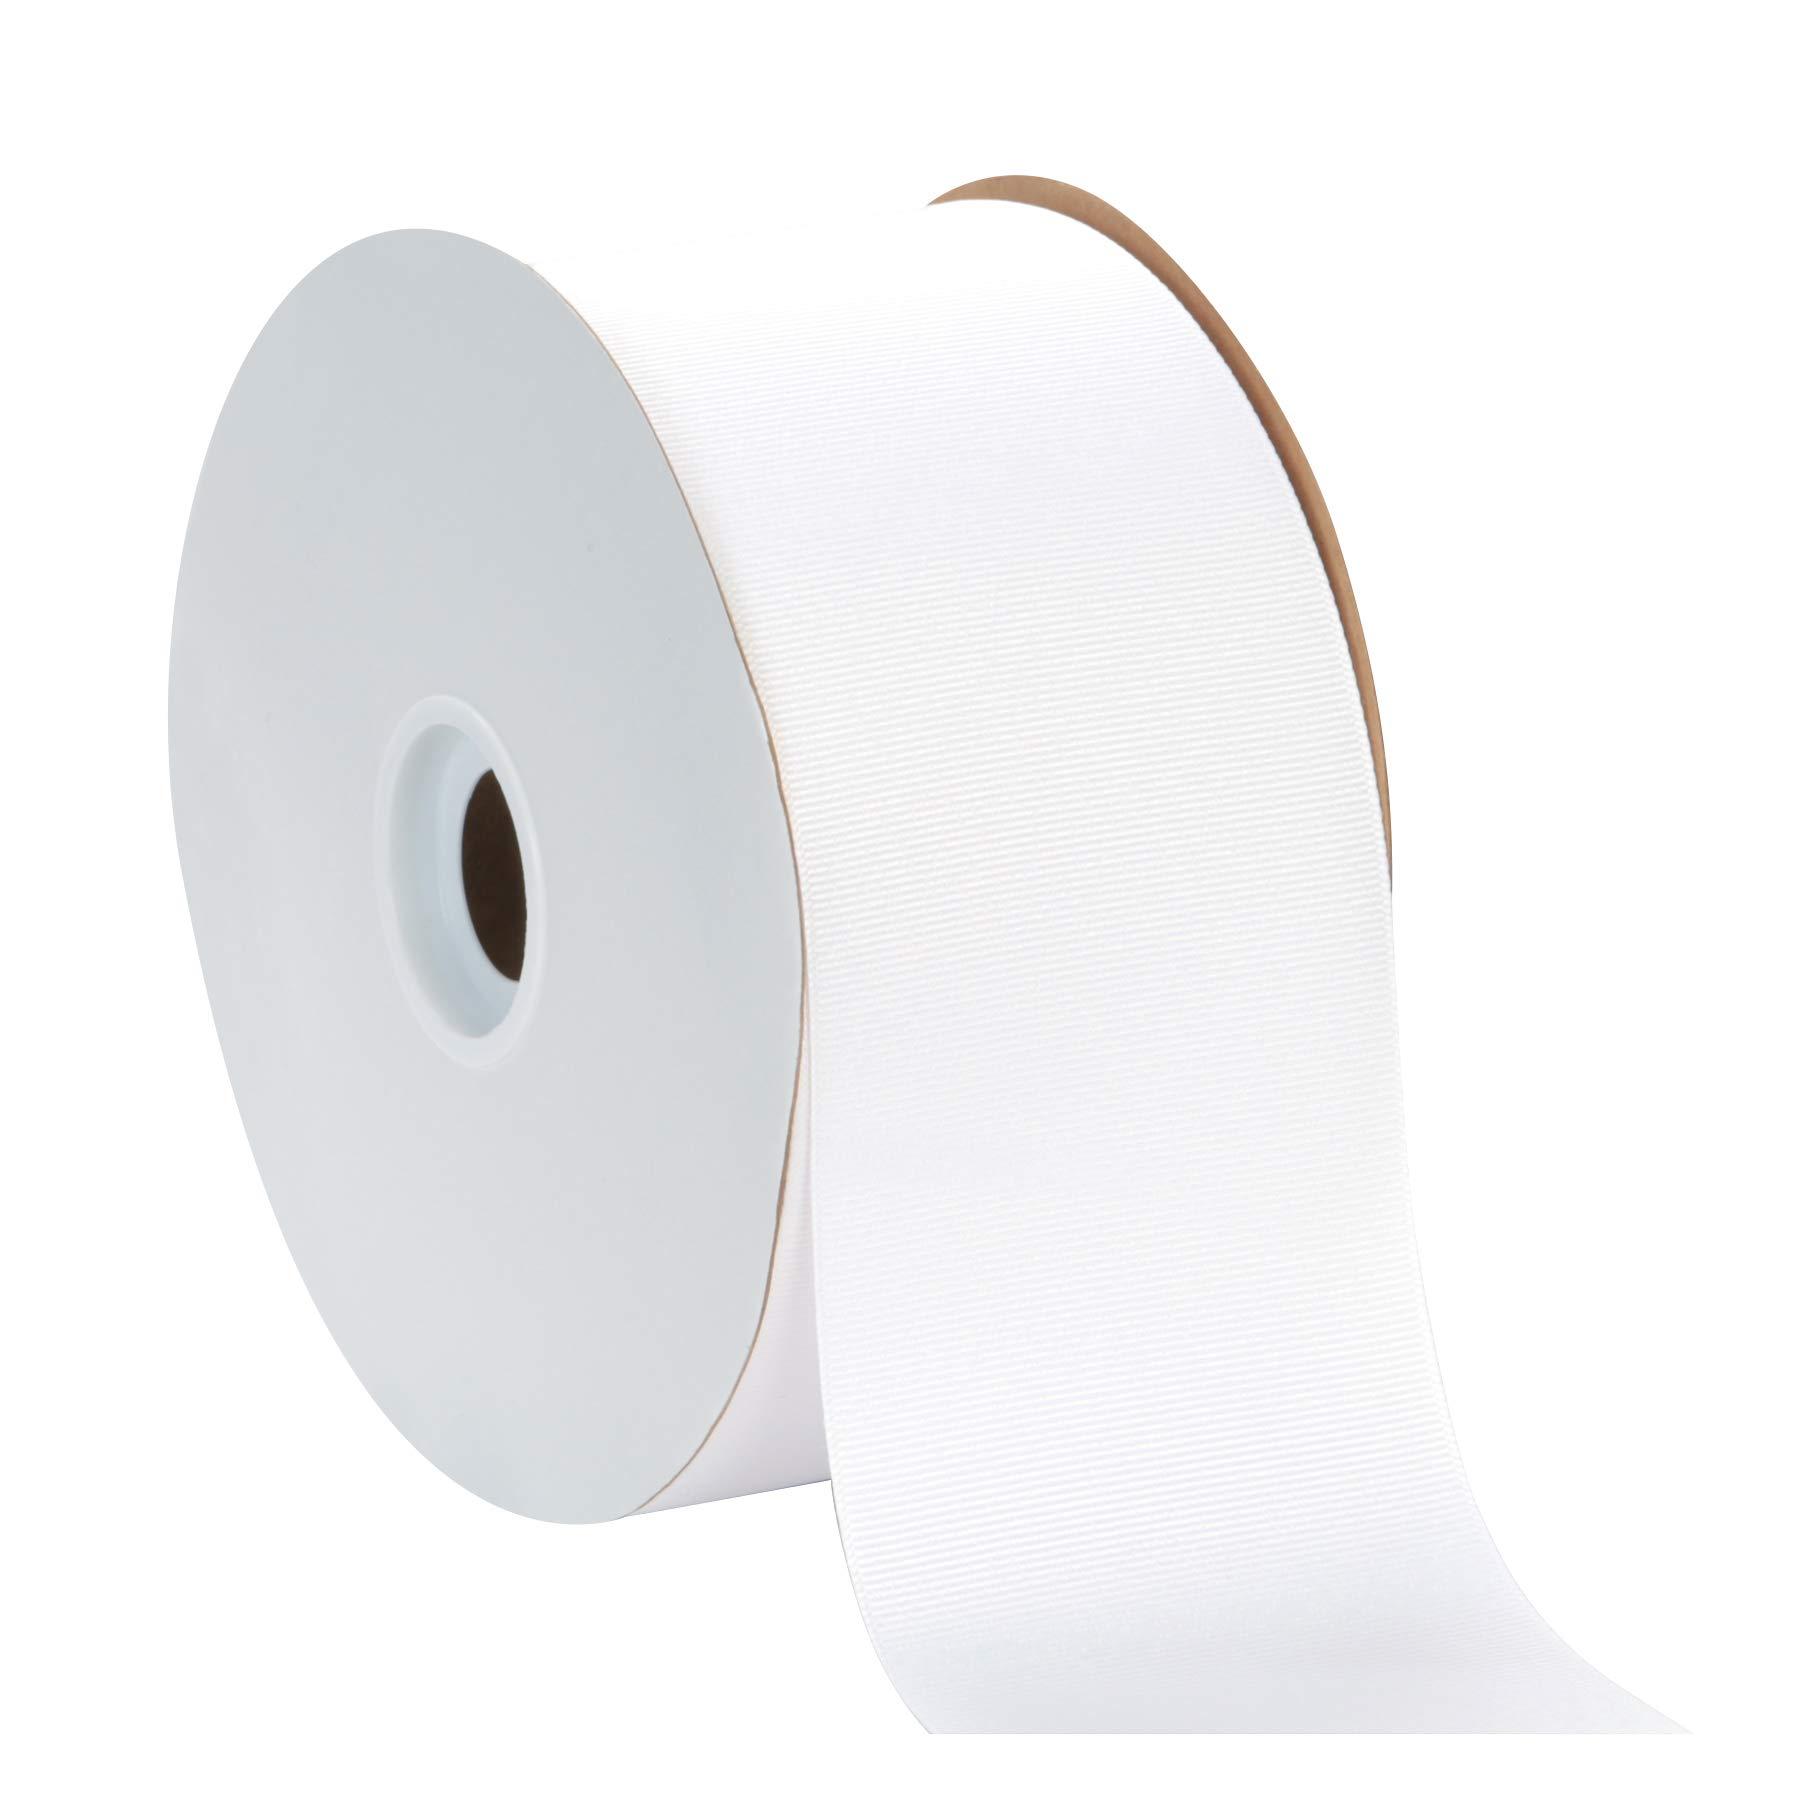 Berwick Offray 3'' Grosgrain Ribbon, White, 50 Yards by Berwick Offray